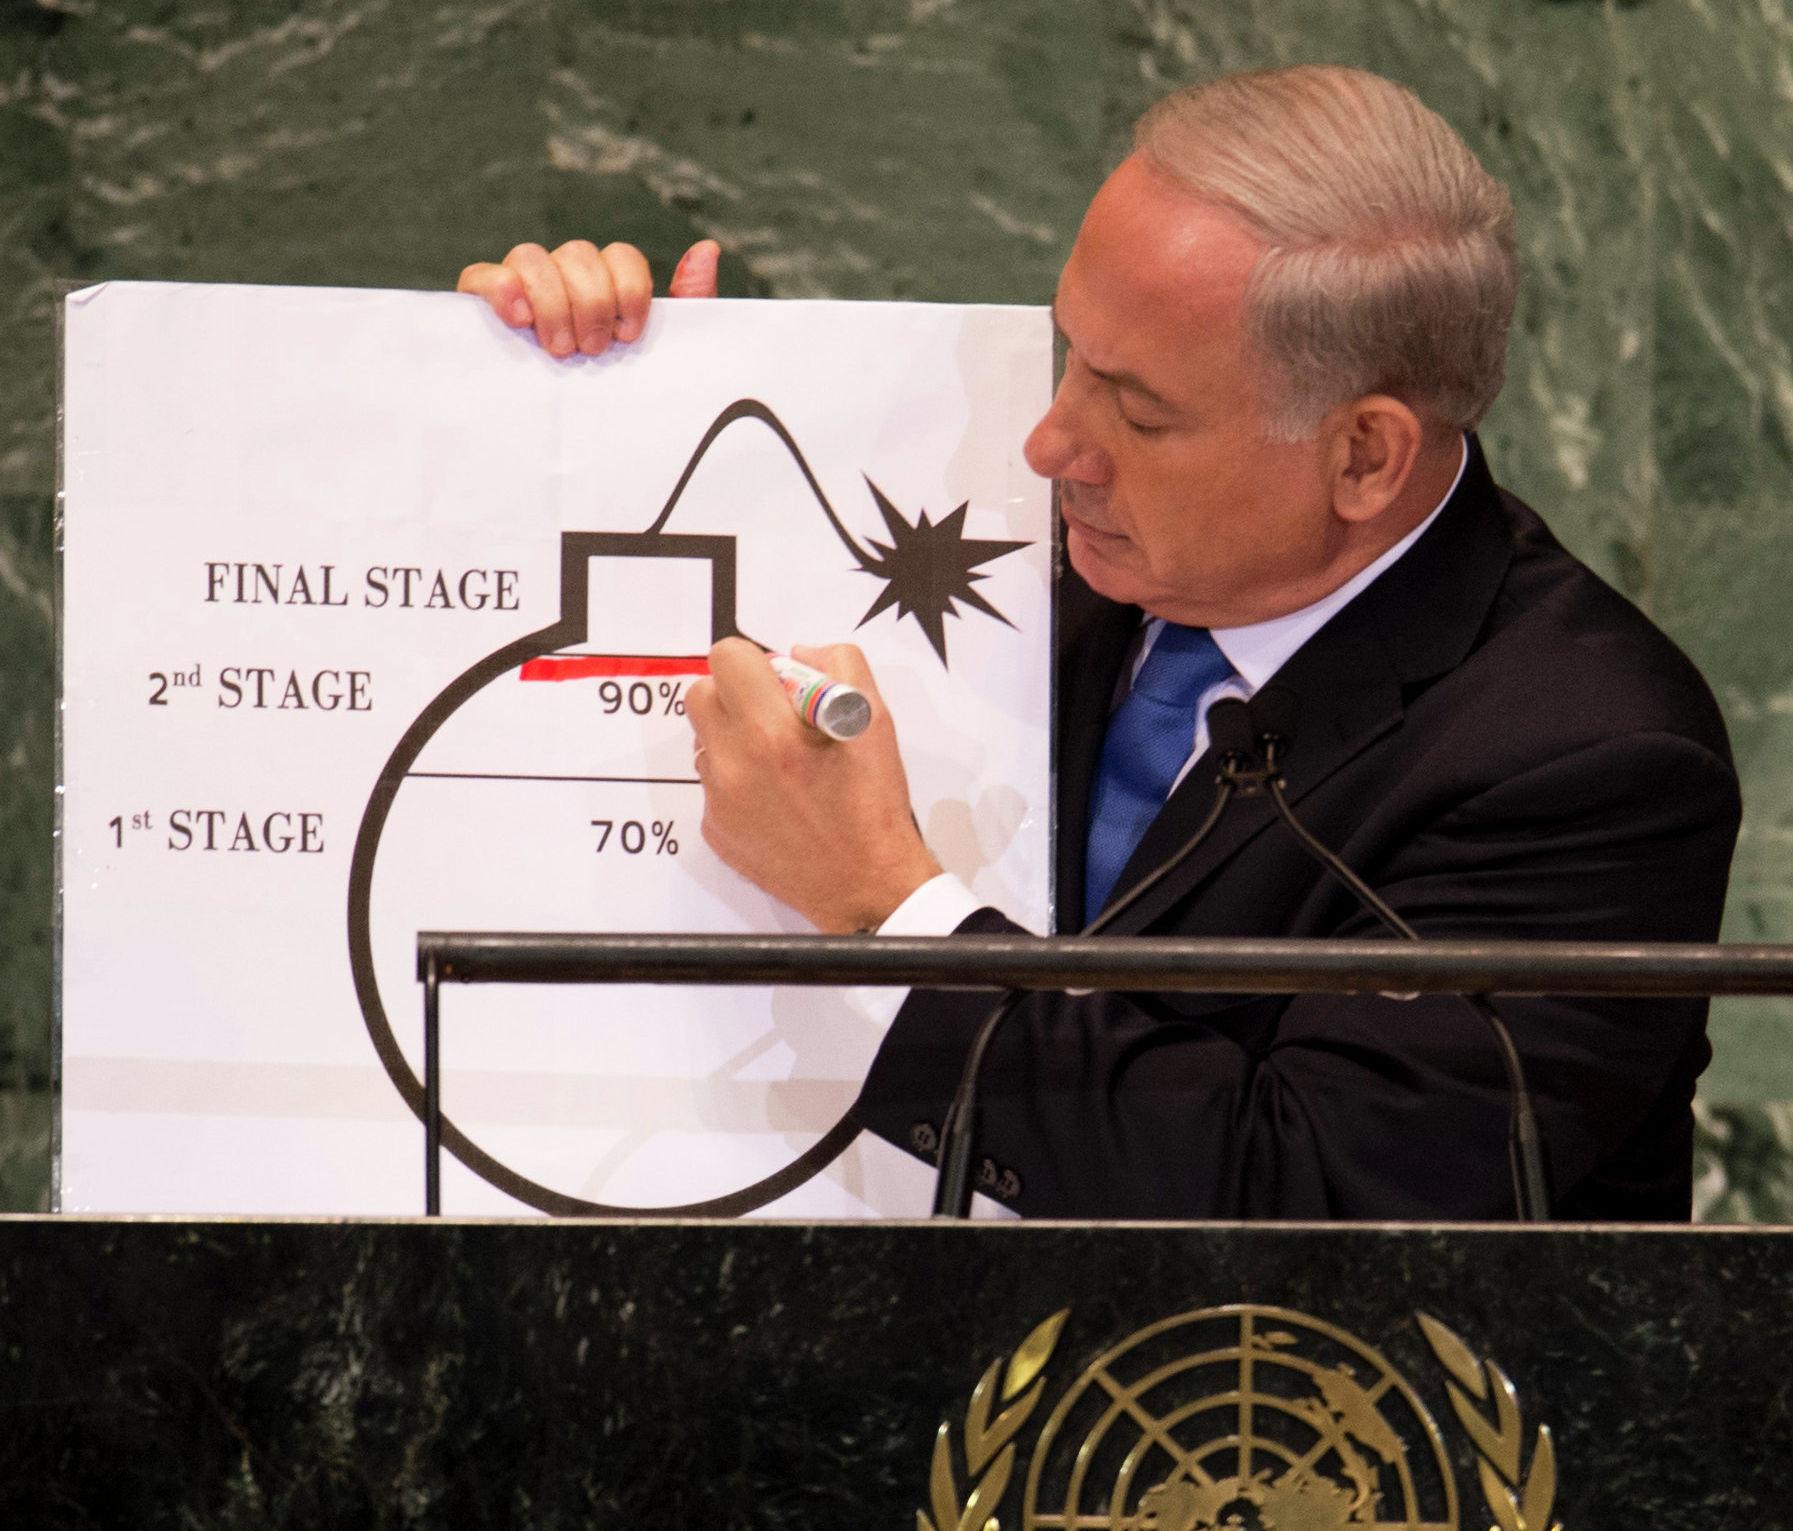 Primeiro-ministro de Israel, Benjamin Netanyahu, fala sobre o programa nuclear iraniano na ONU